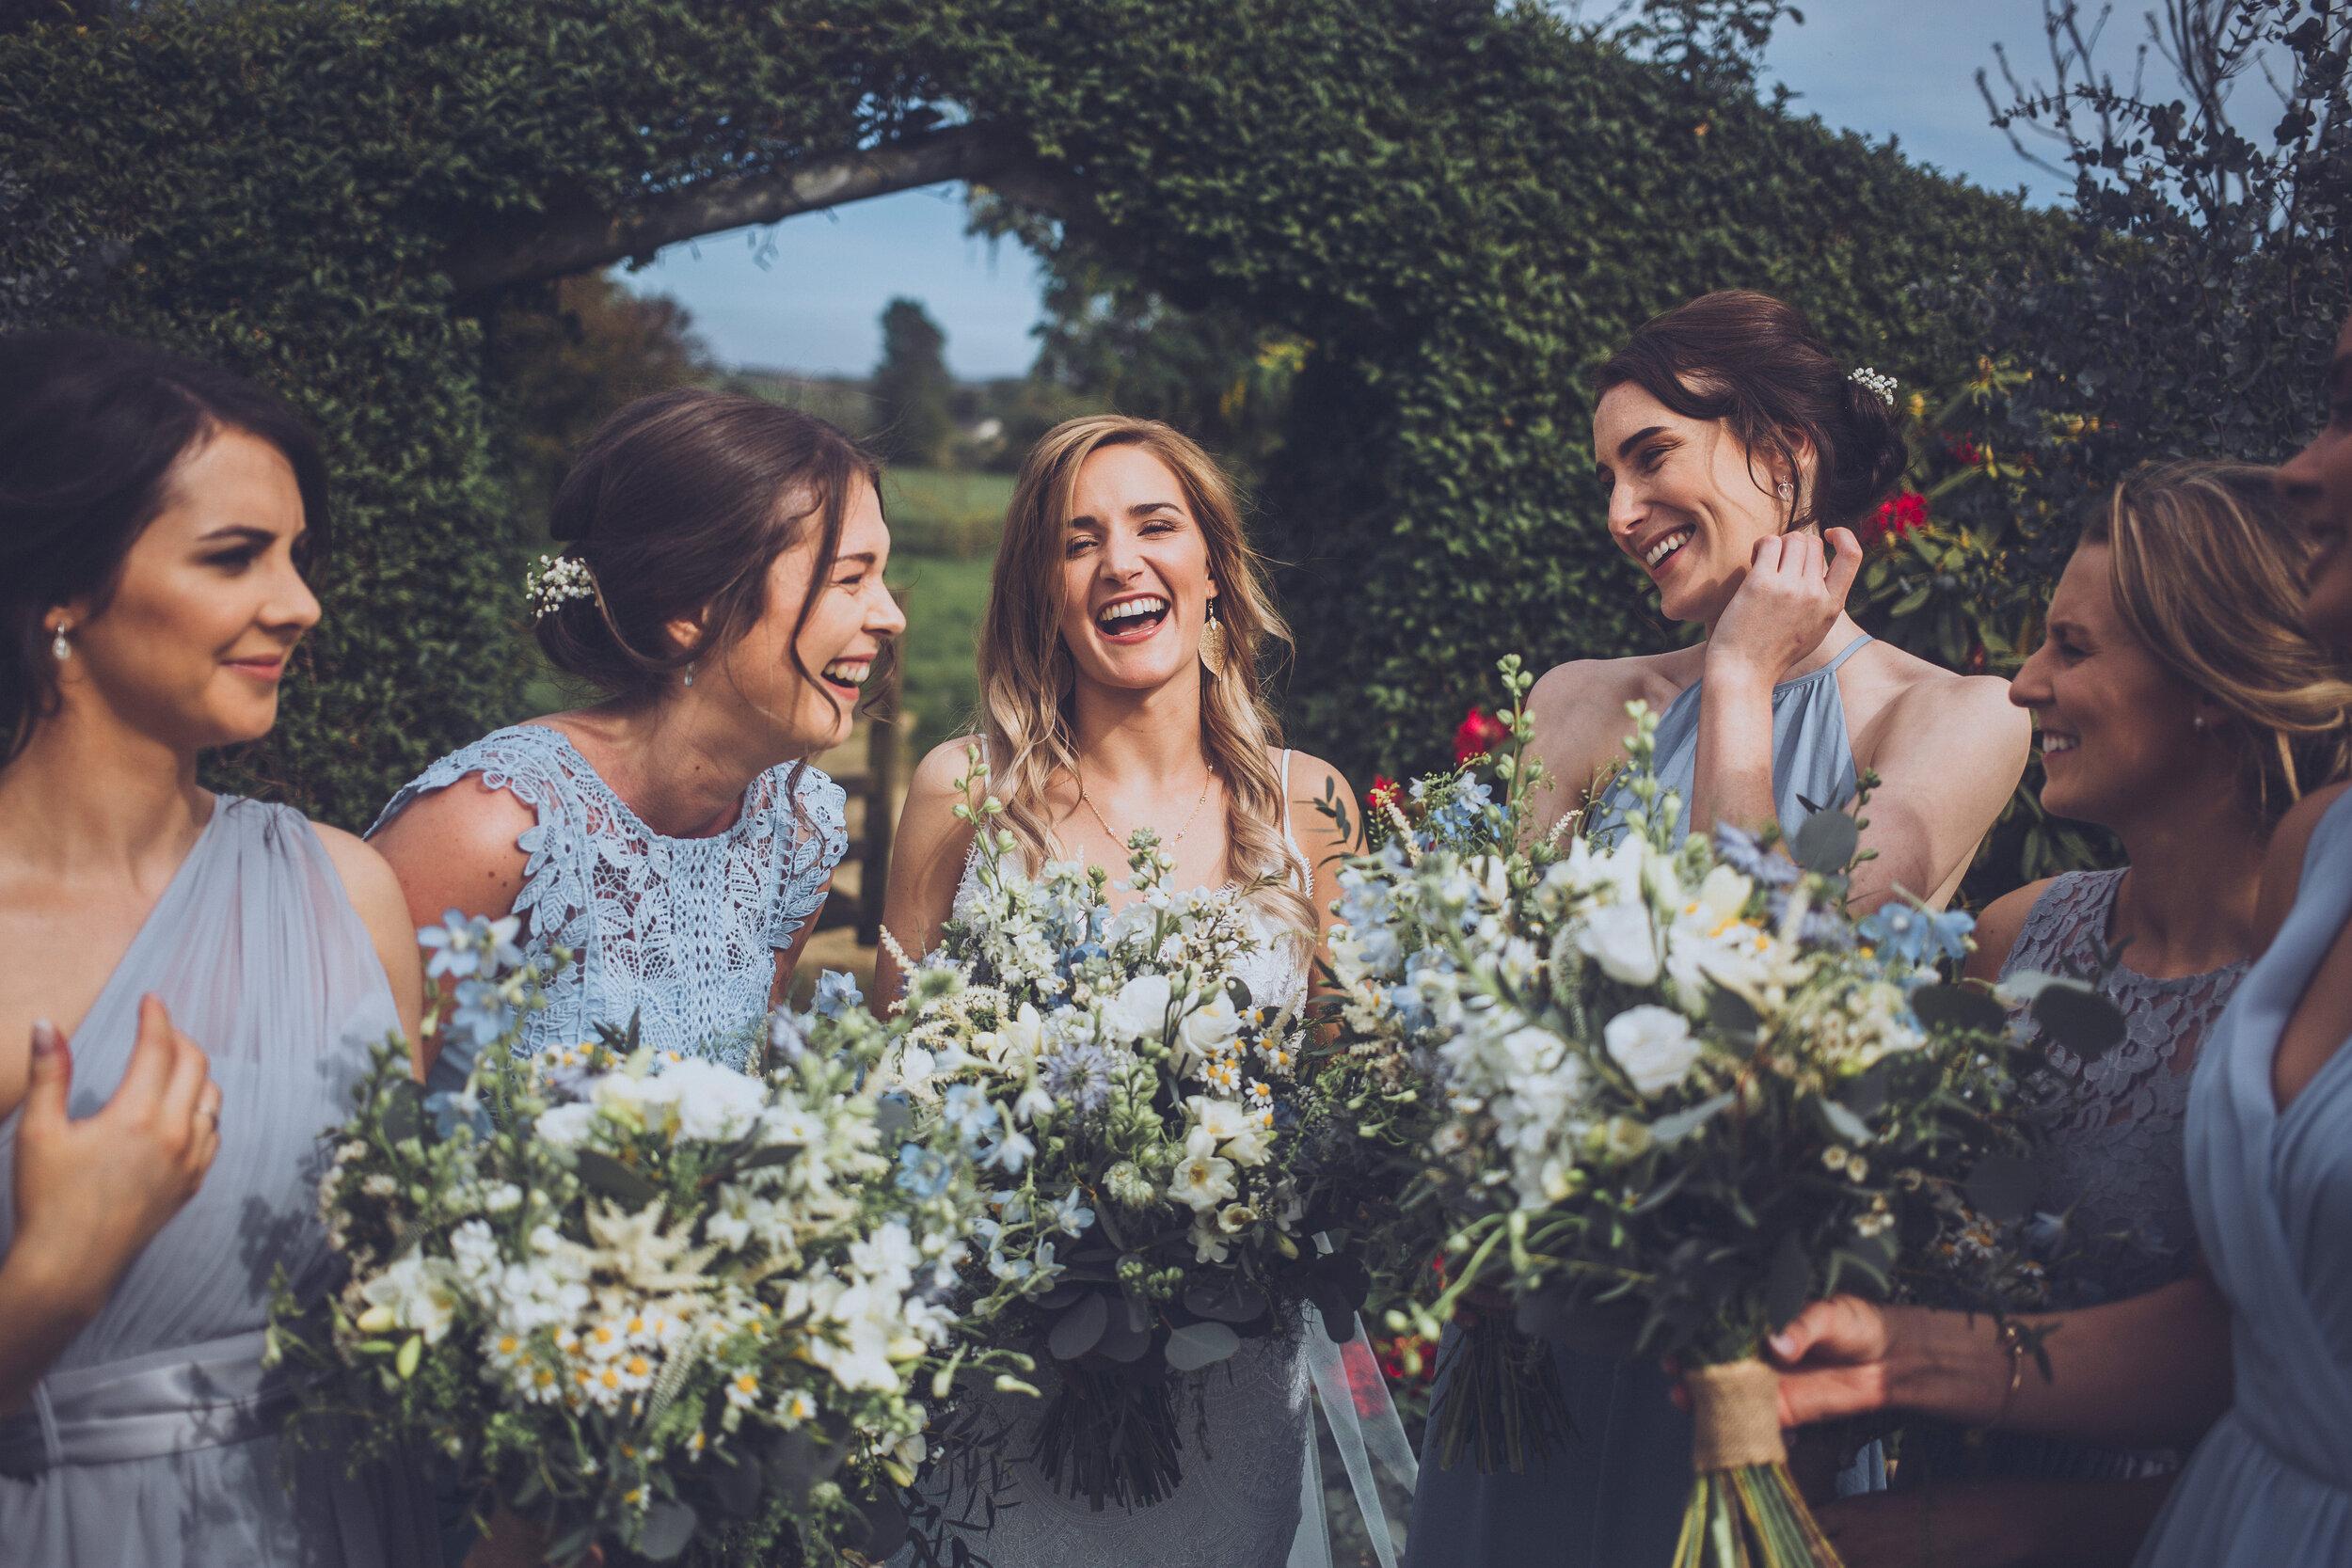 Dalduff Farm Ayrshire Wedding Photography - Claire Basiuk Photographer - 18.jpg